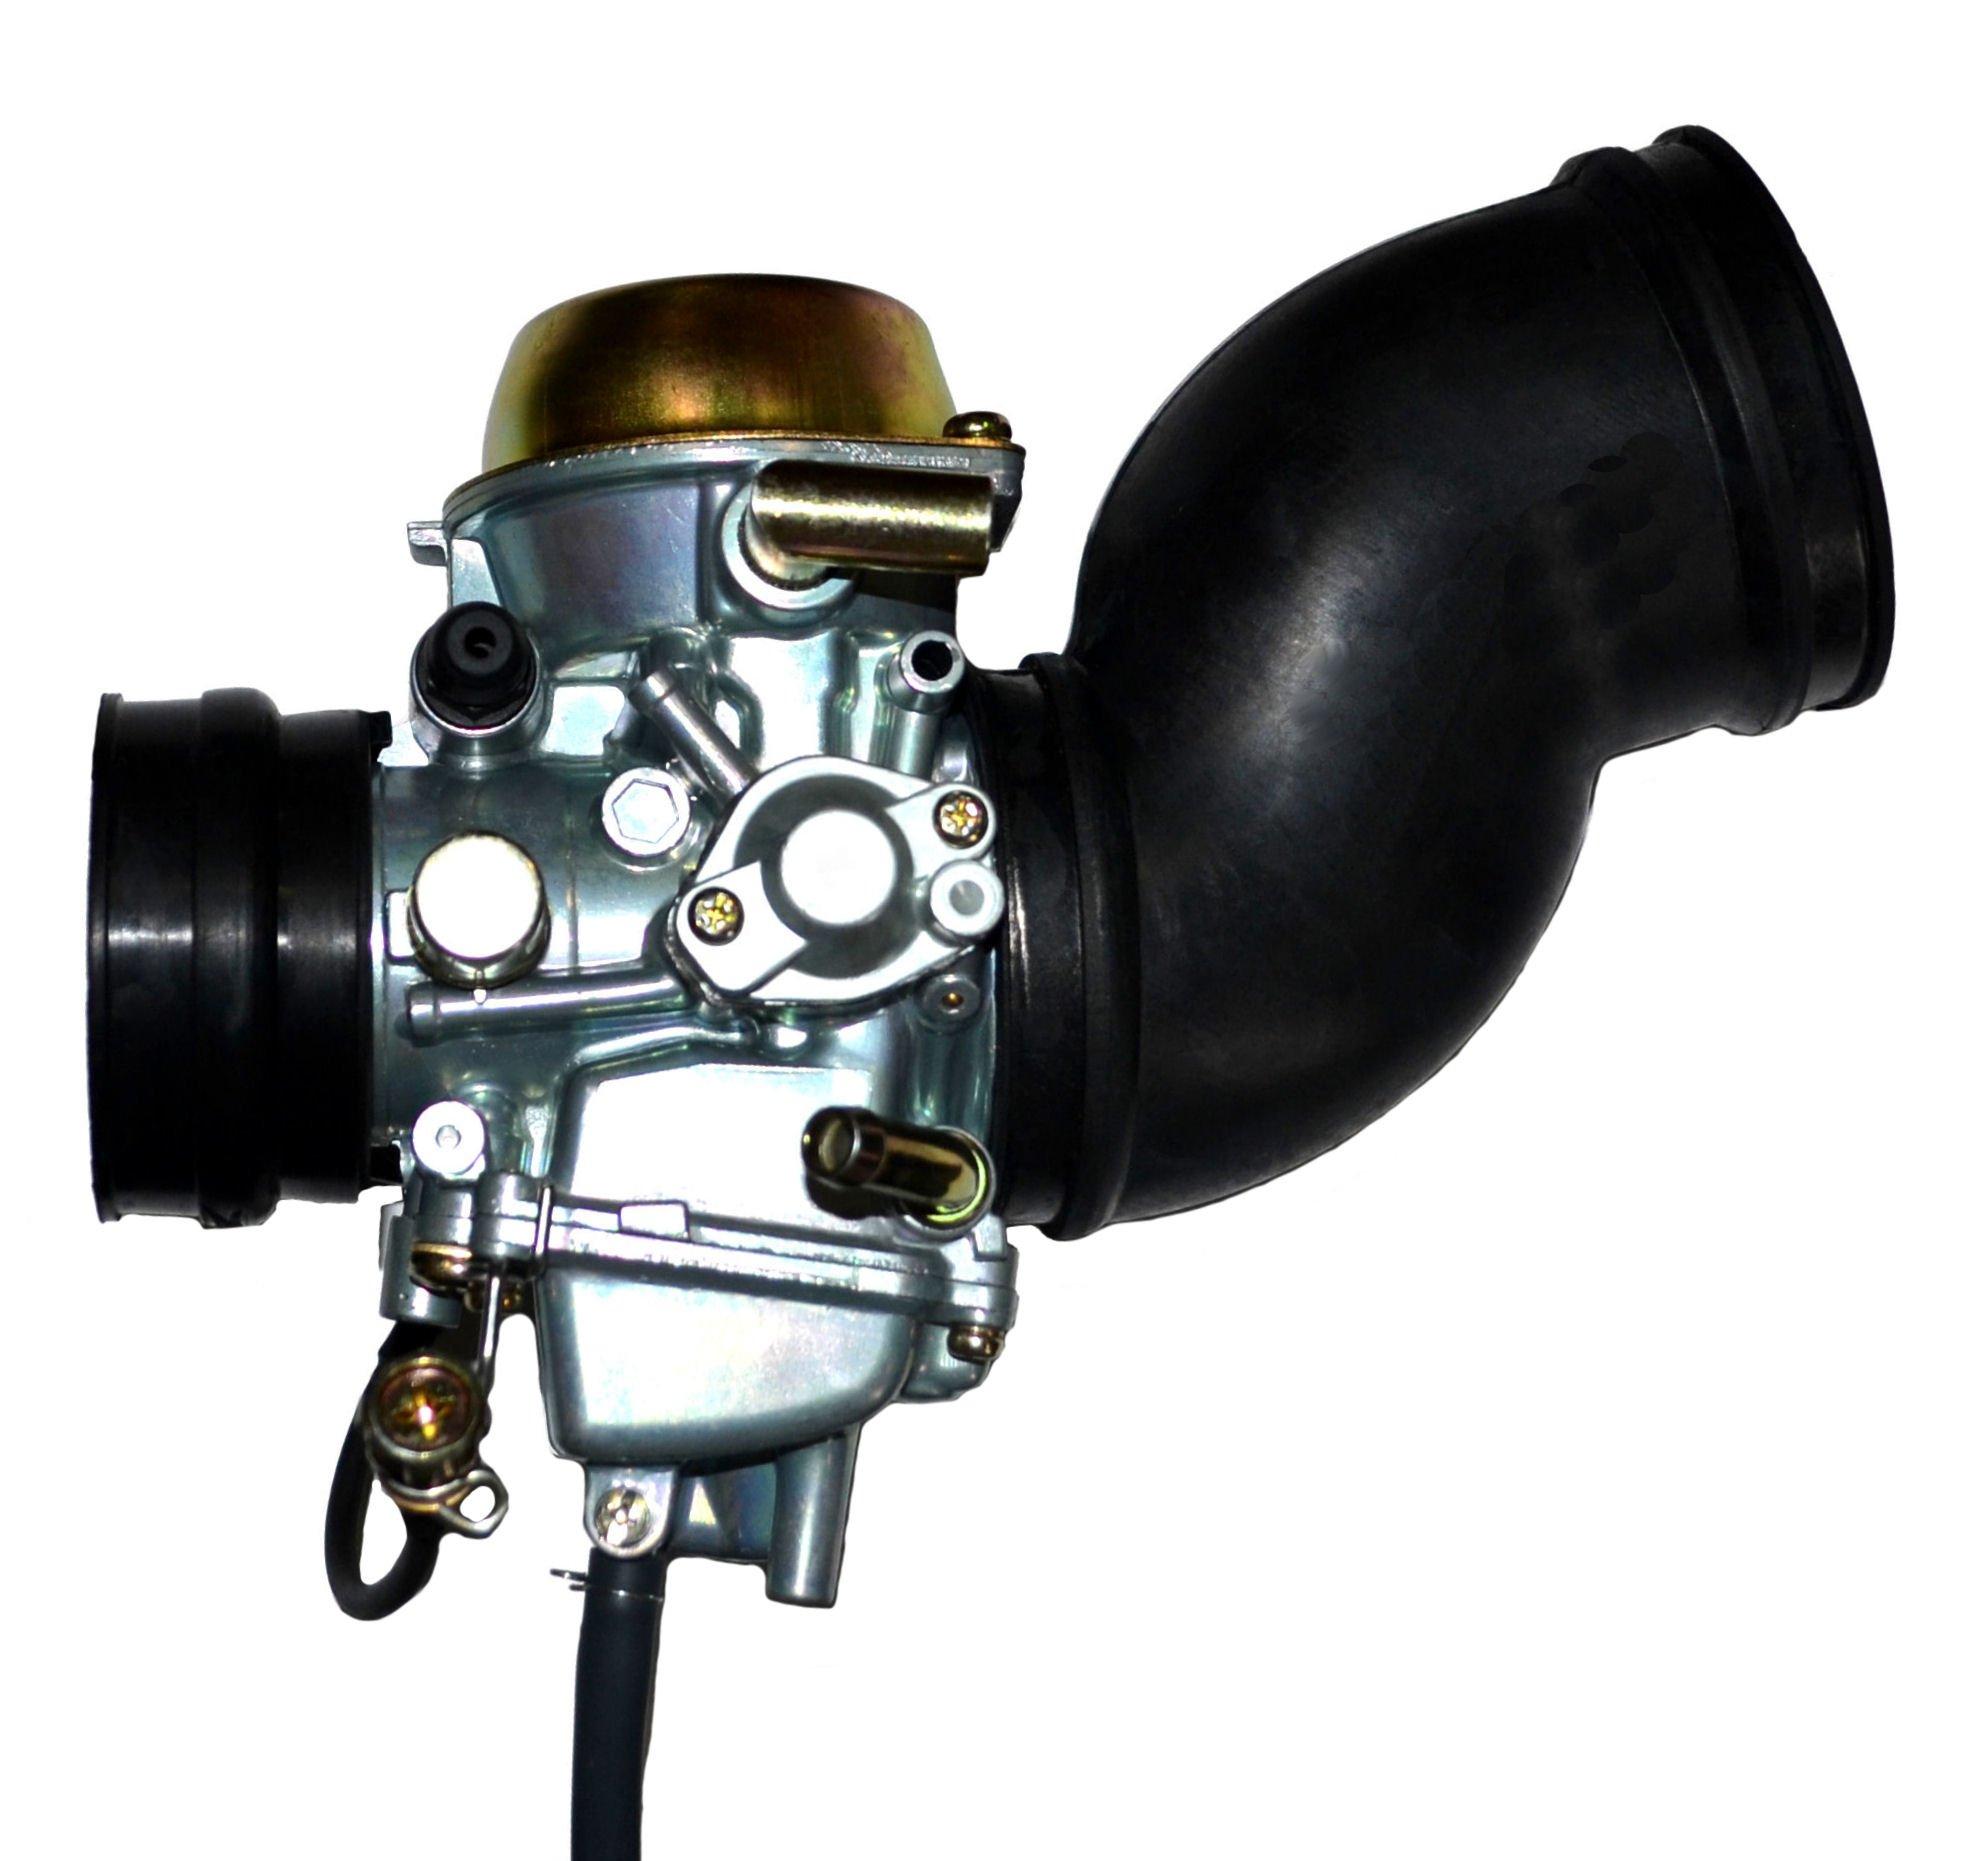 ZOOM ZOOM PARTS Yamaha Grizzly YFM 600 Carburetor + 2 FREE Intake Manifold Boot Carb 1998 1999 2000 2001